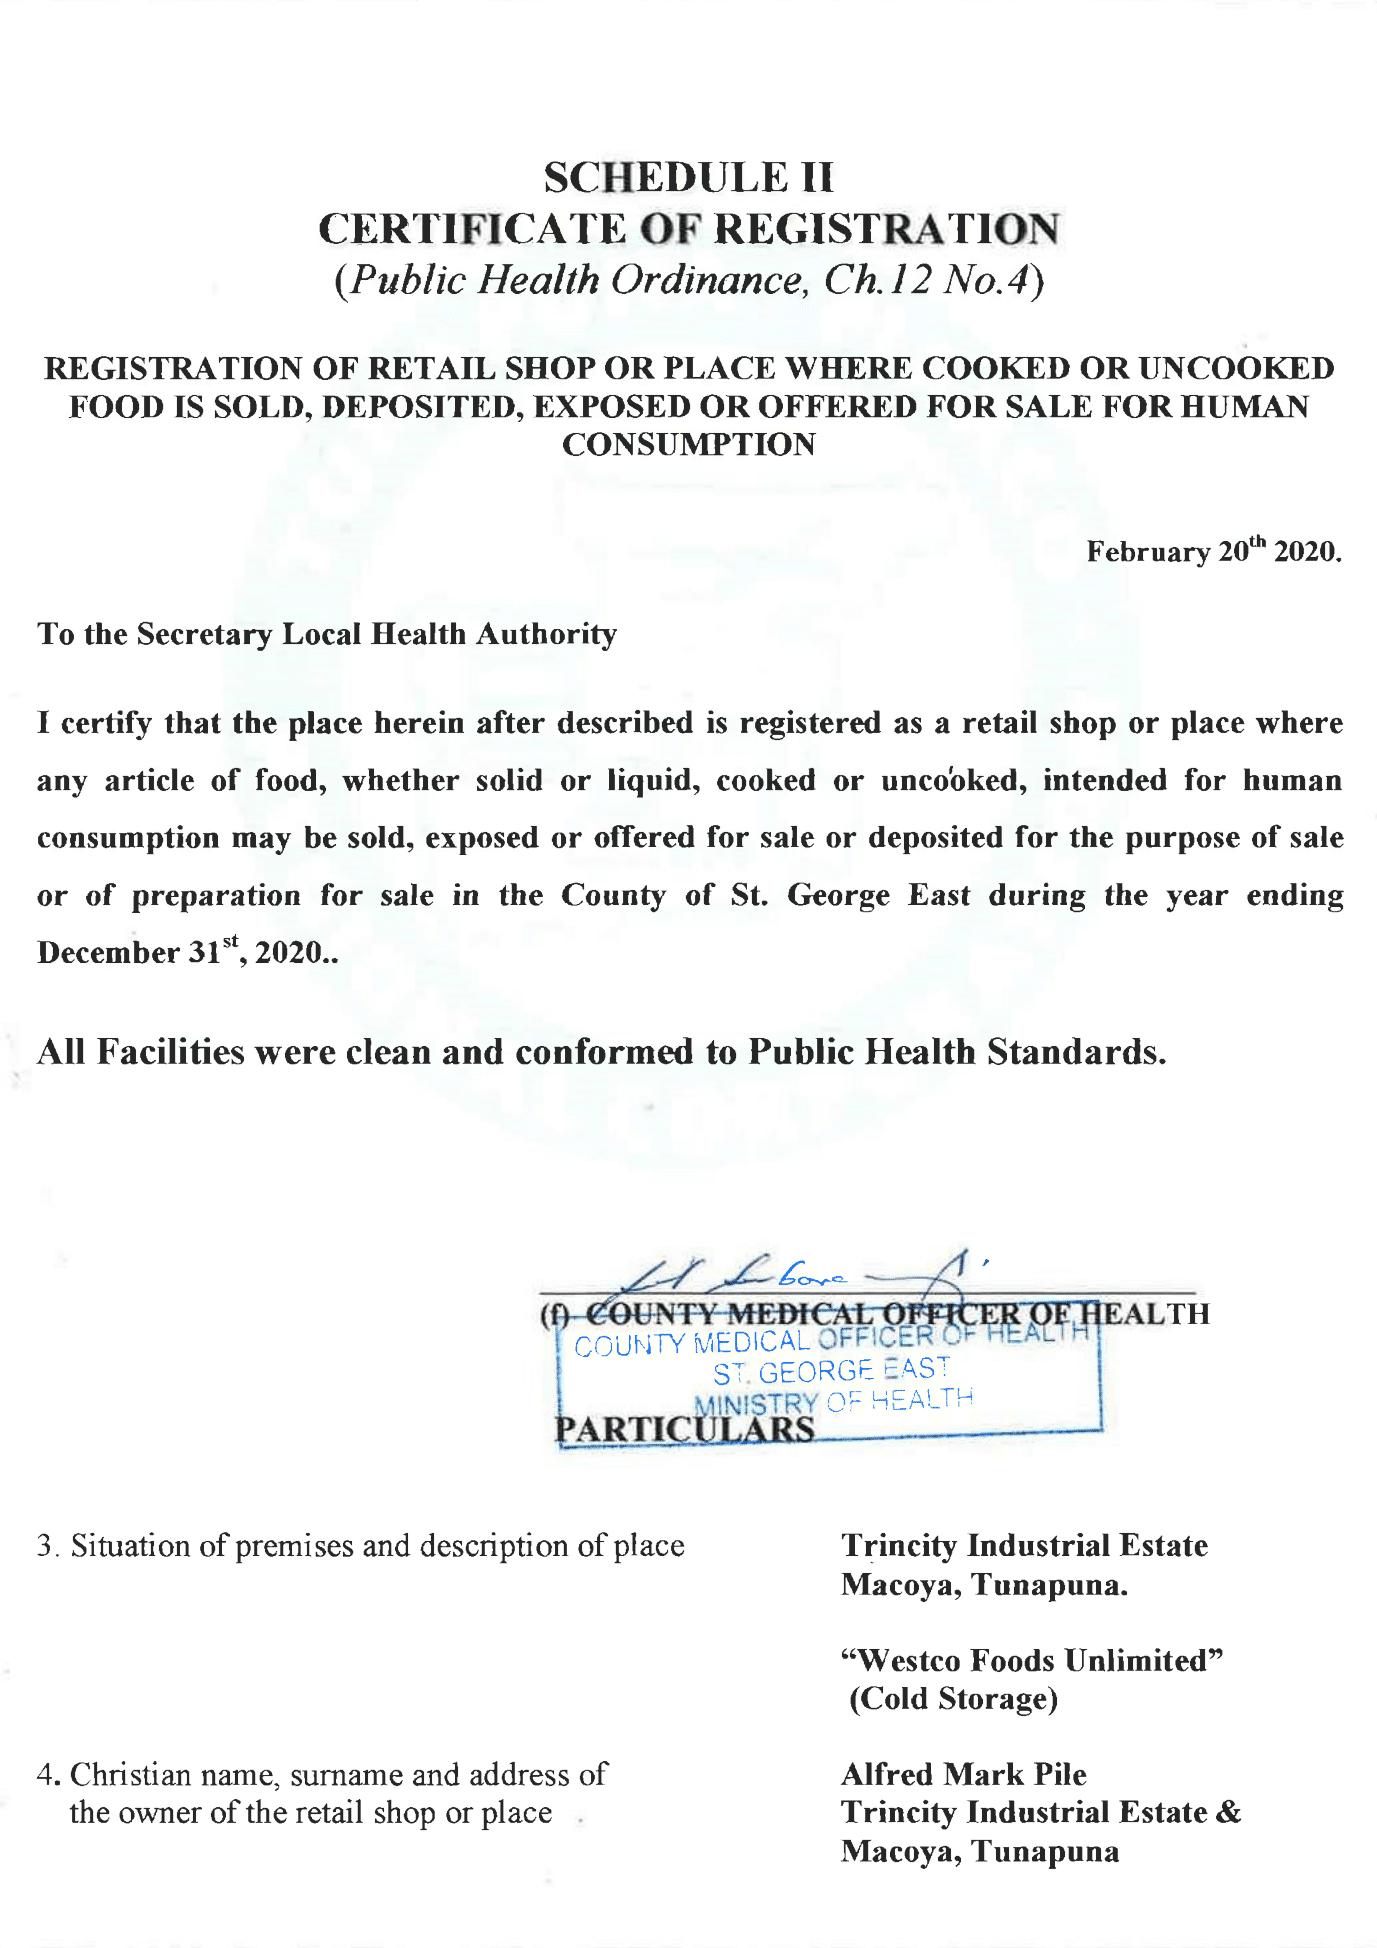 Health Certificate 1 1 edited